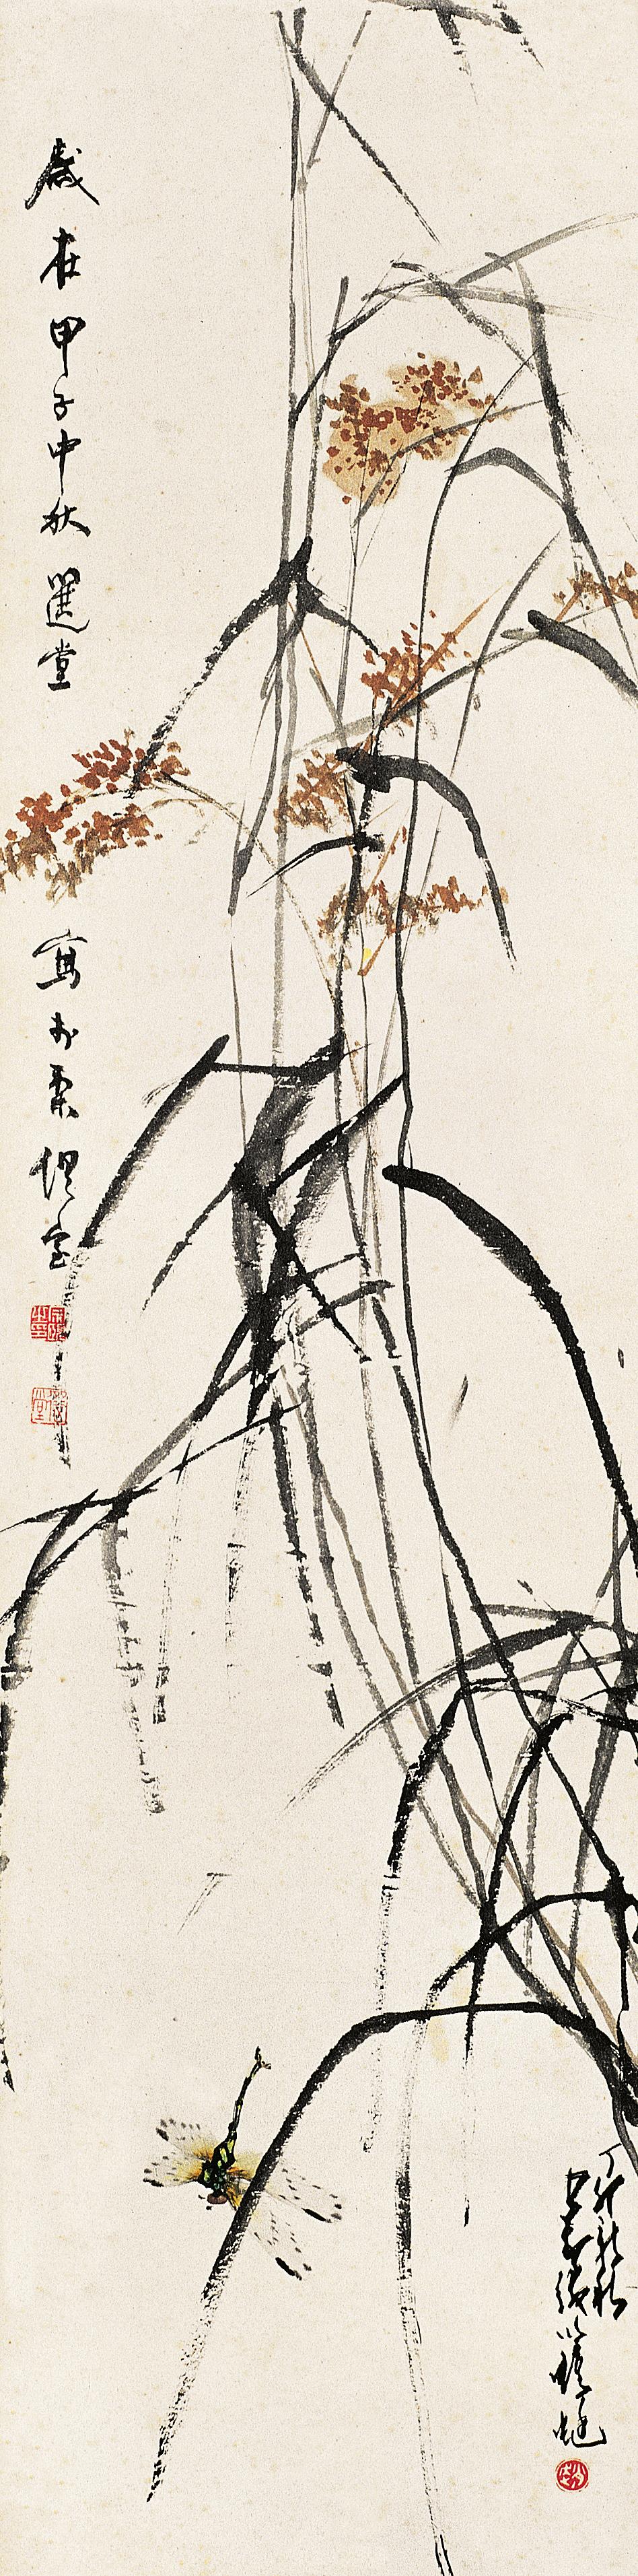 Jao Tsung-I   Zhao Shao-ang